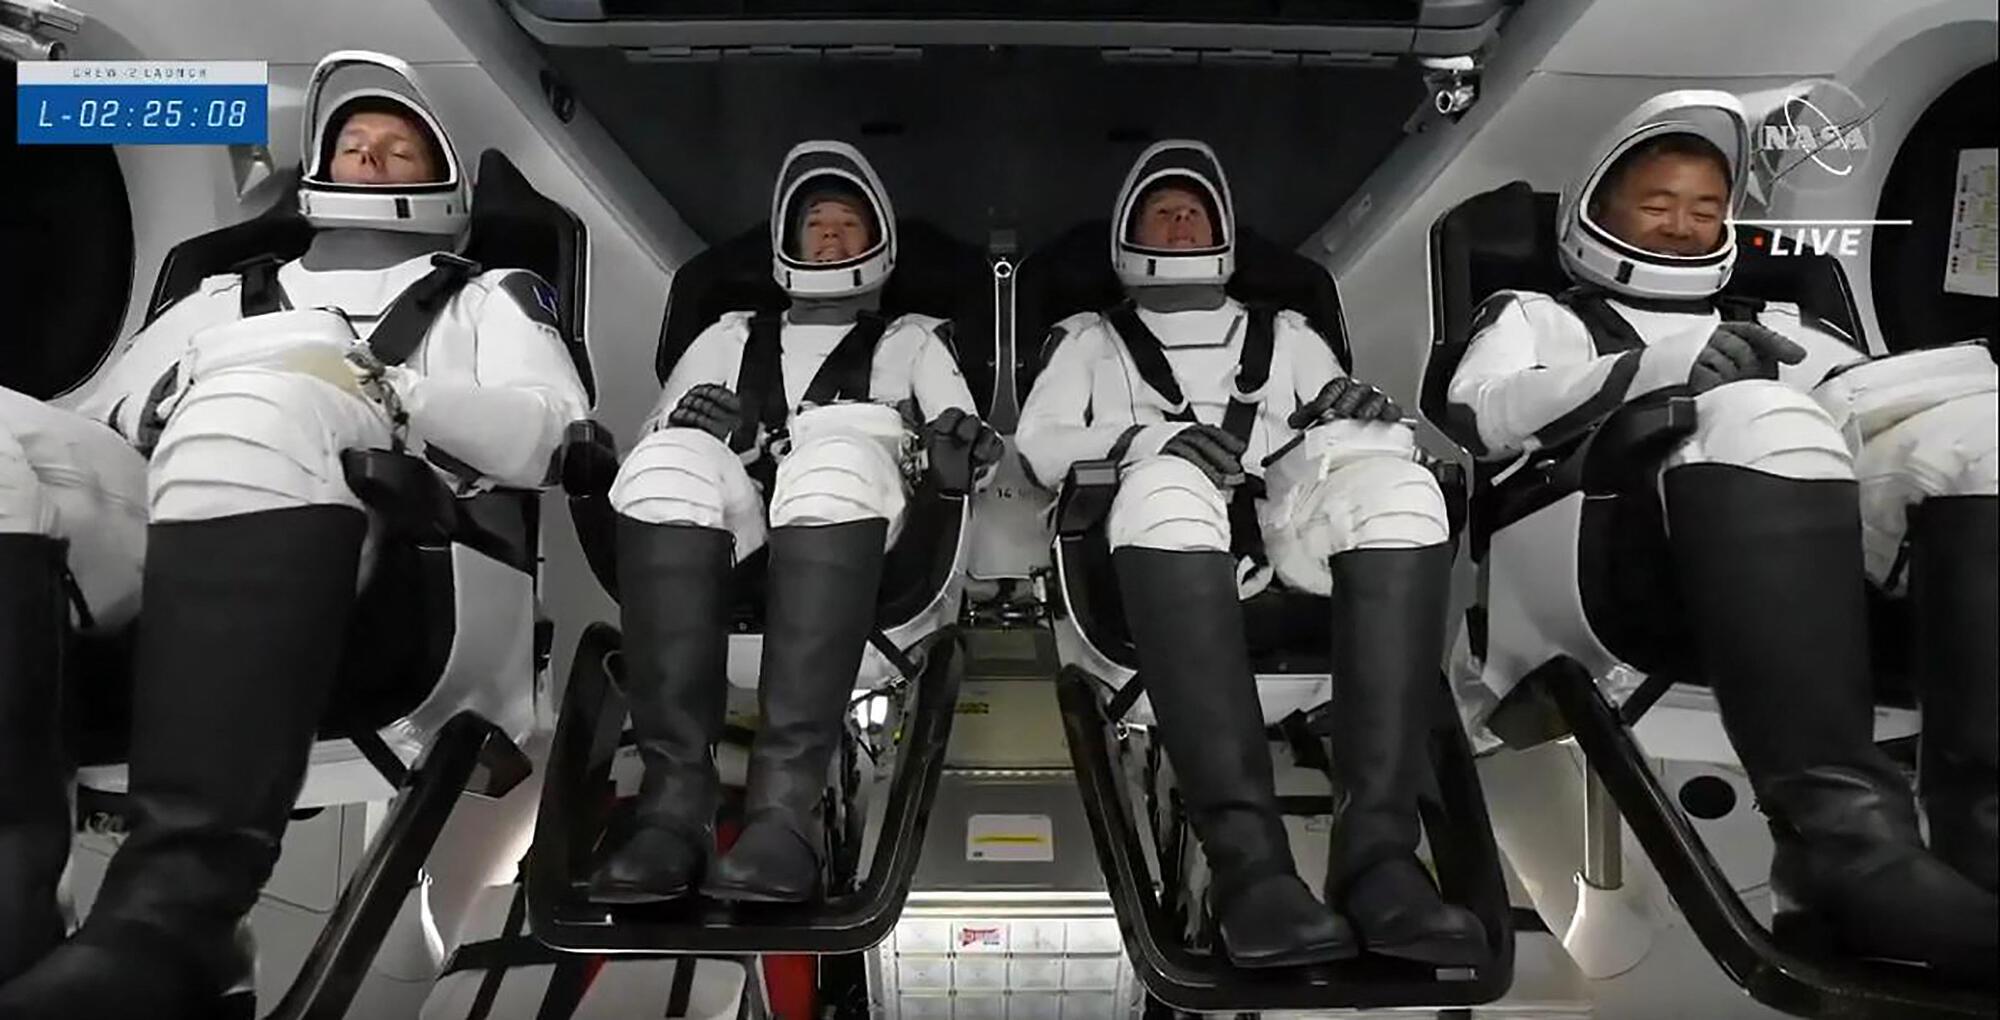 espace cosmonautes 23 04 2021